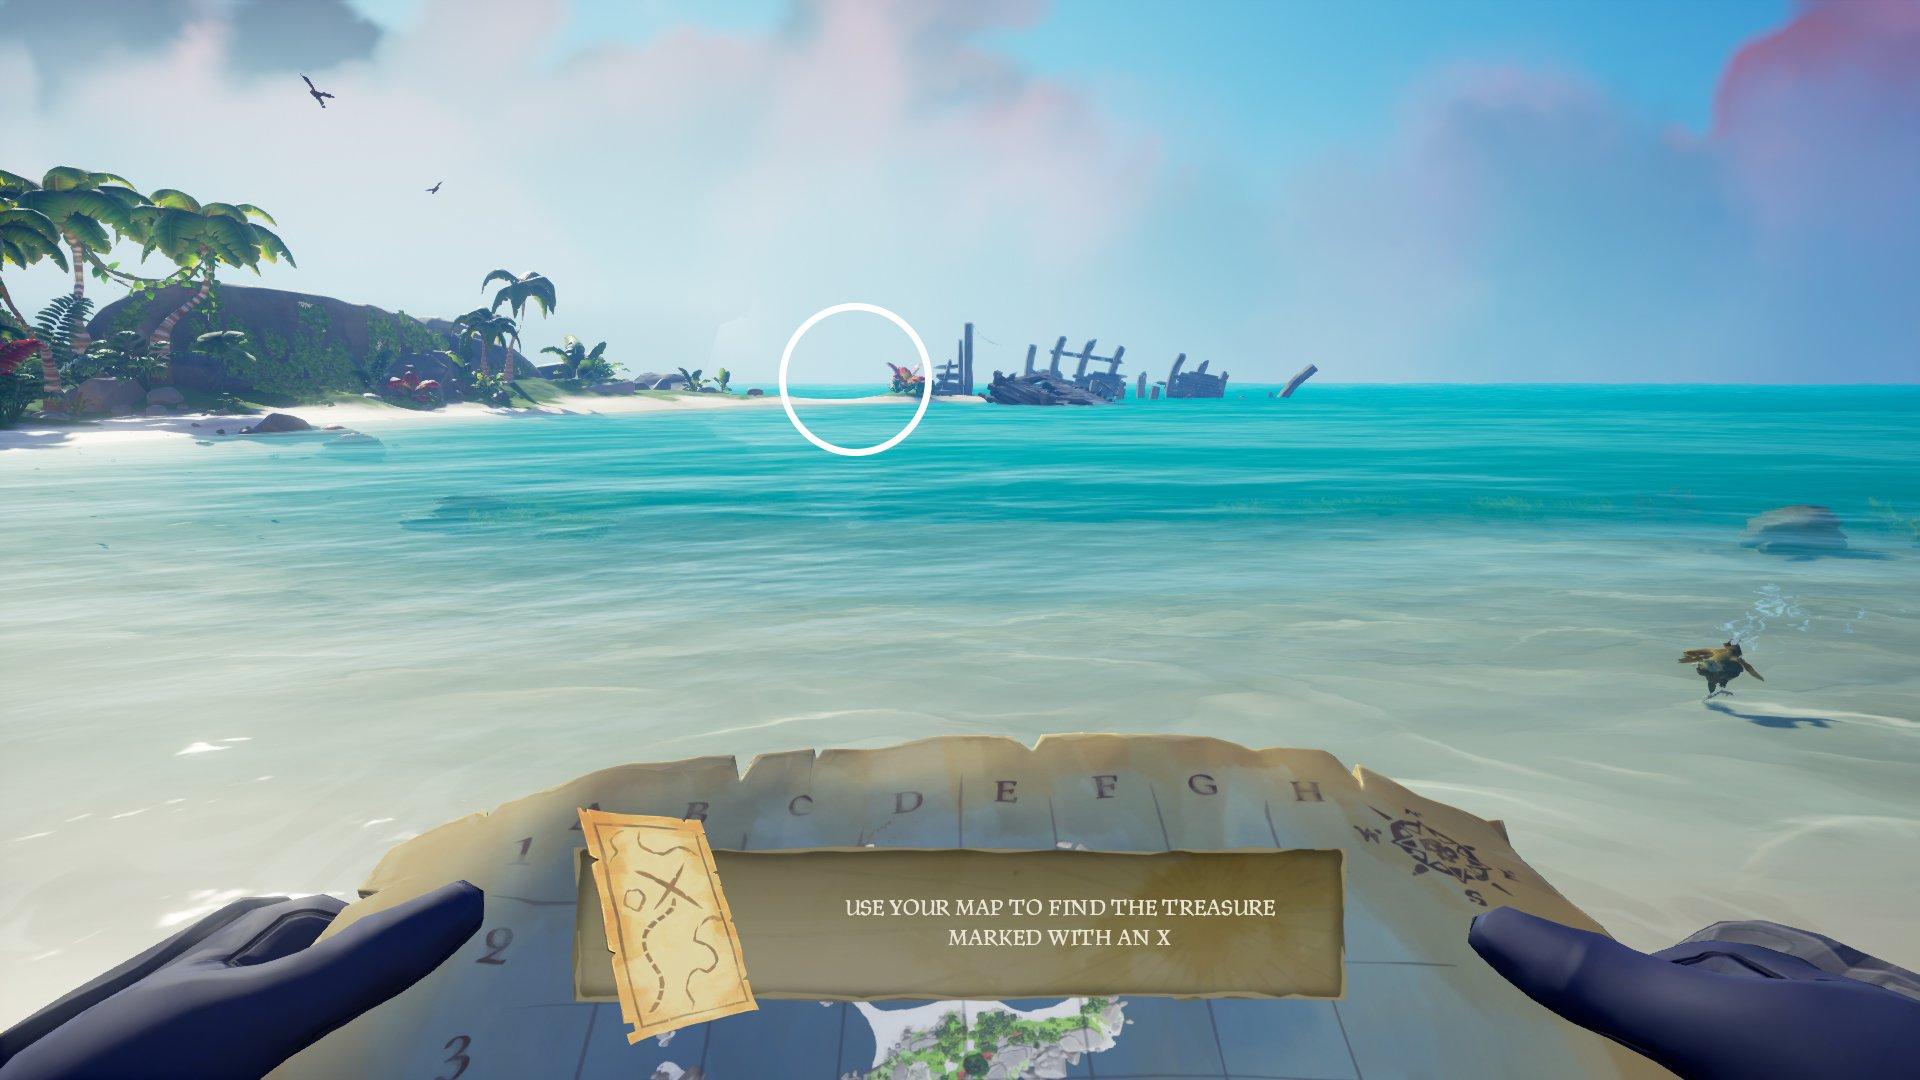 sea of thieves maiden voyage buried treasure location